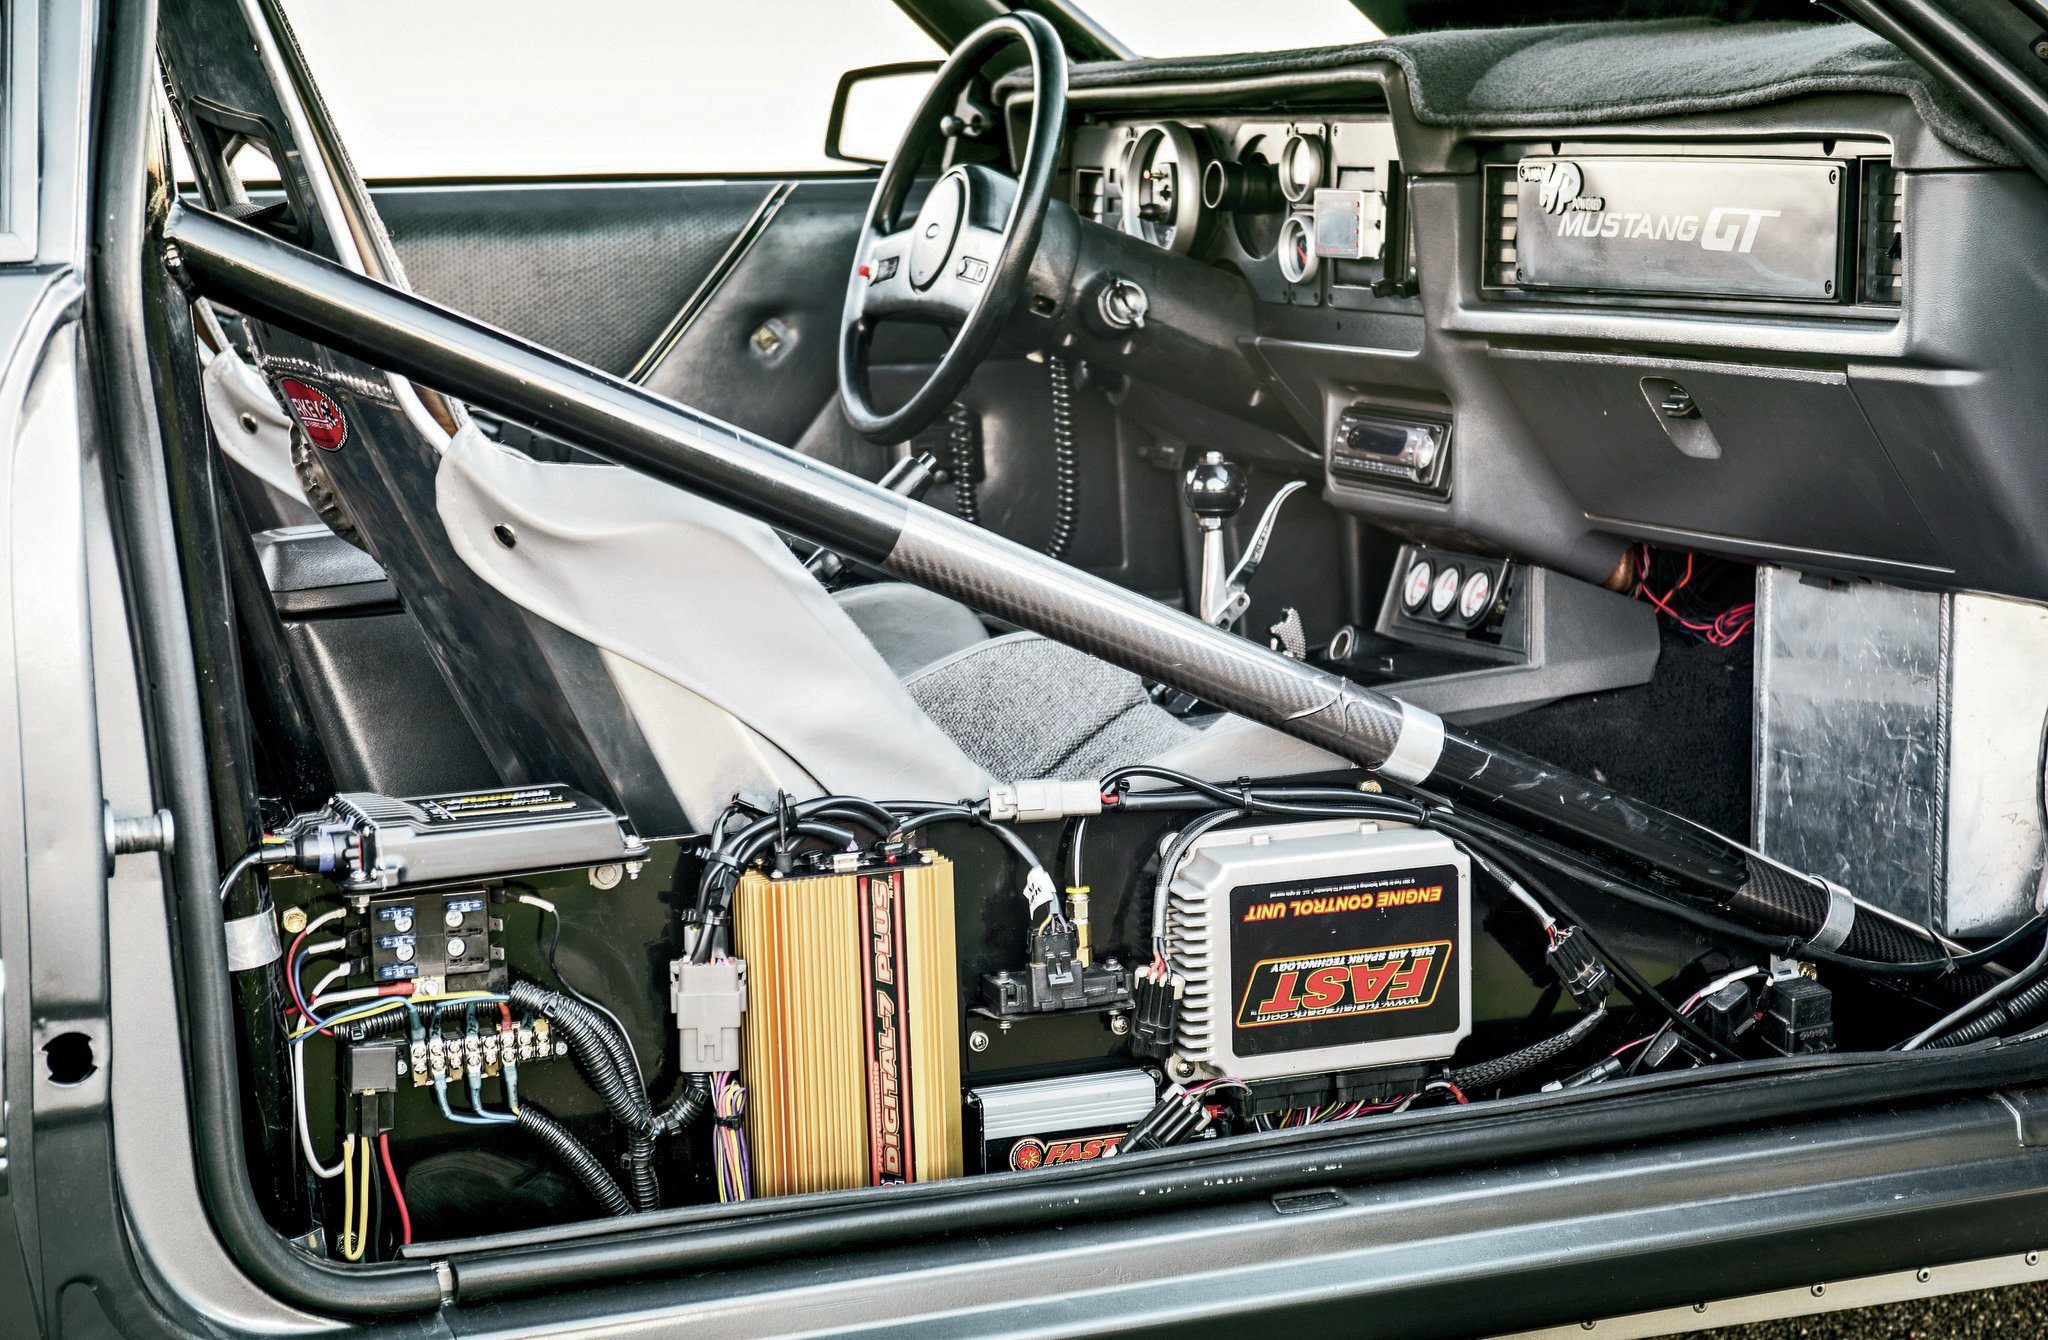 1986 Ford Mustang Gt Rollcage Interior